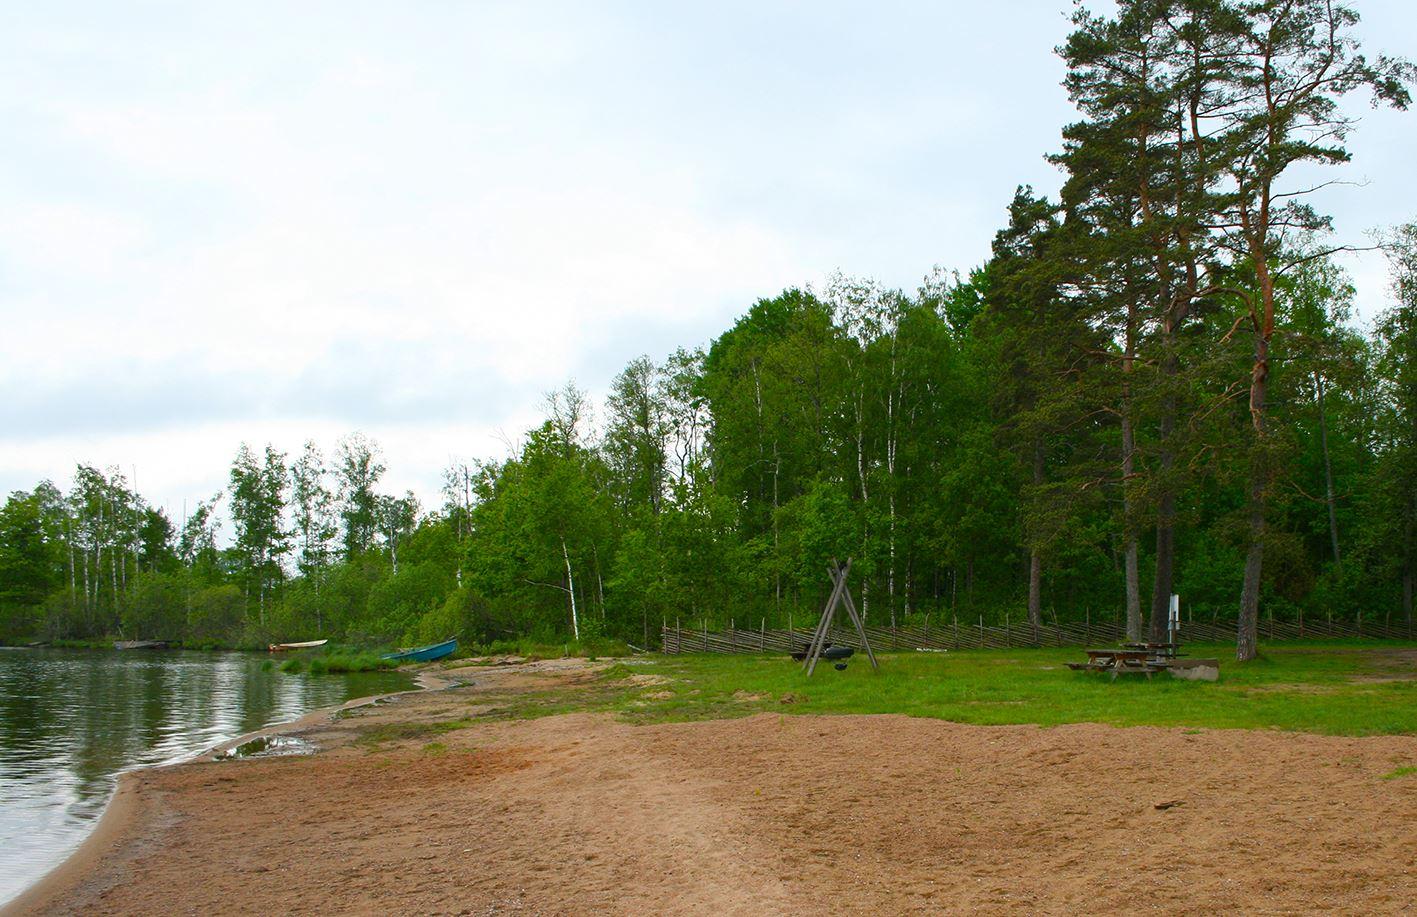 Bathing-place Agunnaryd